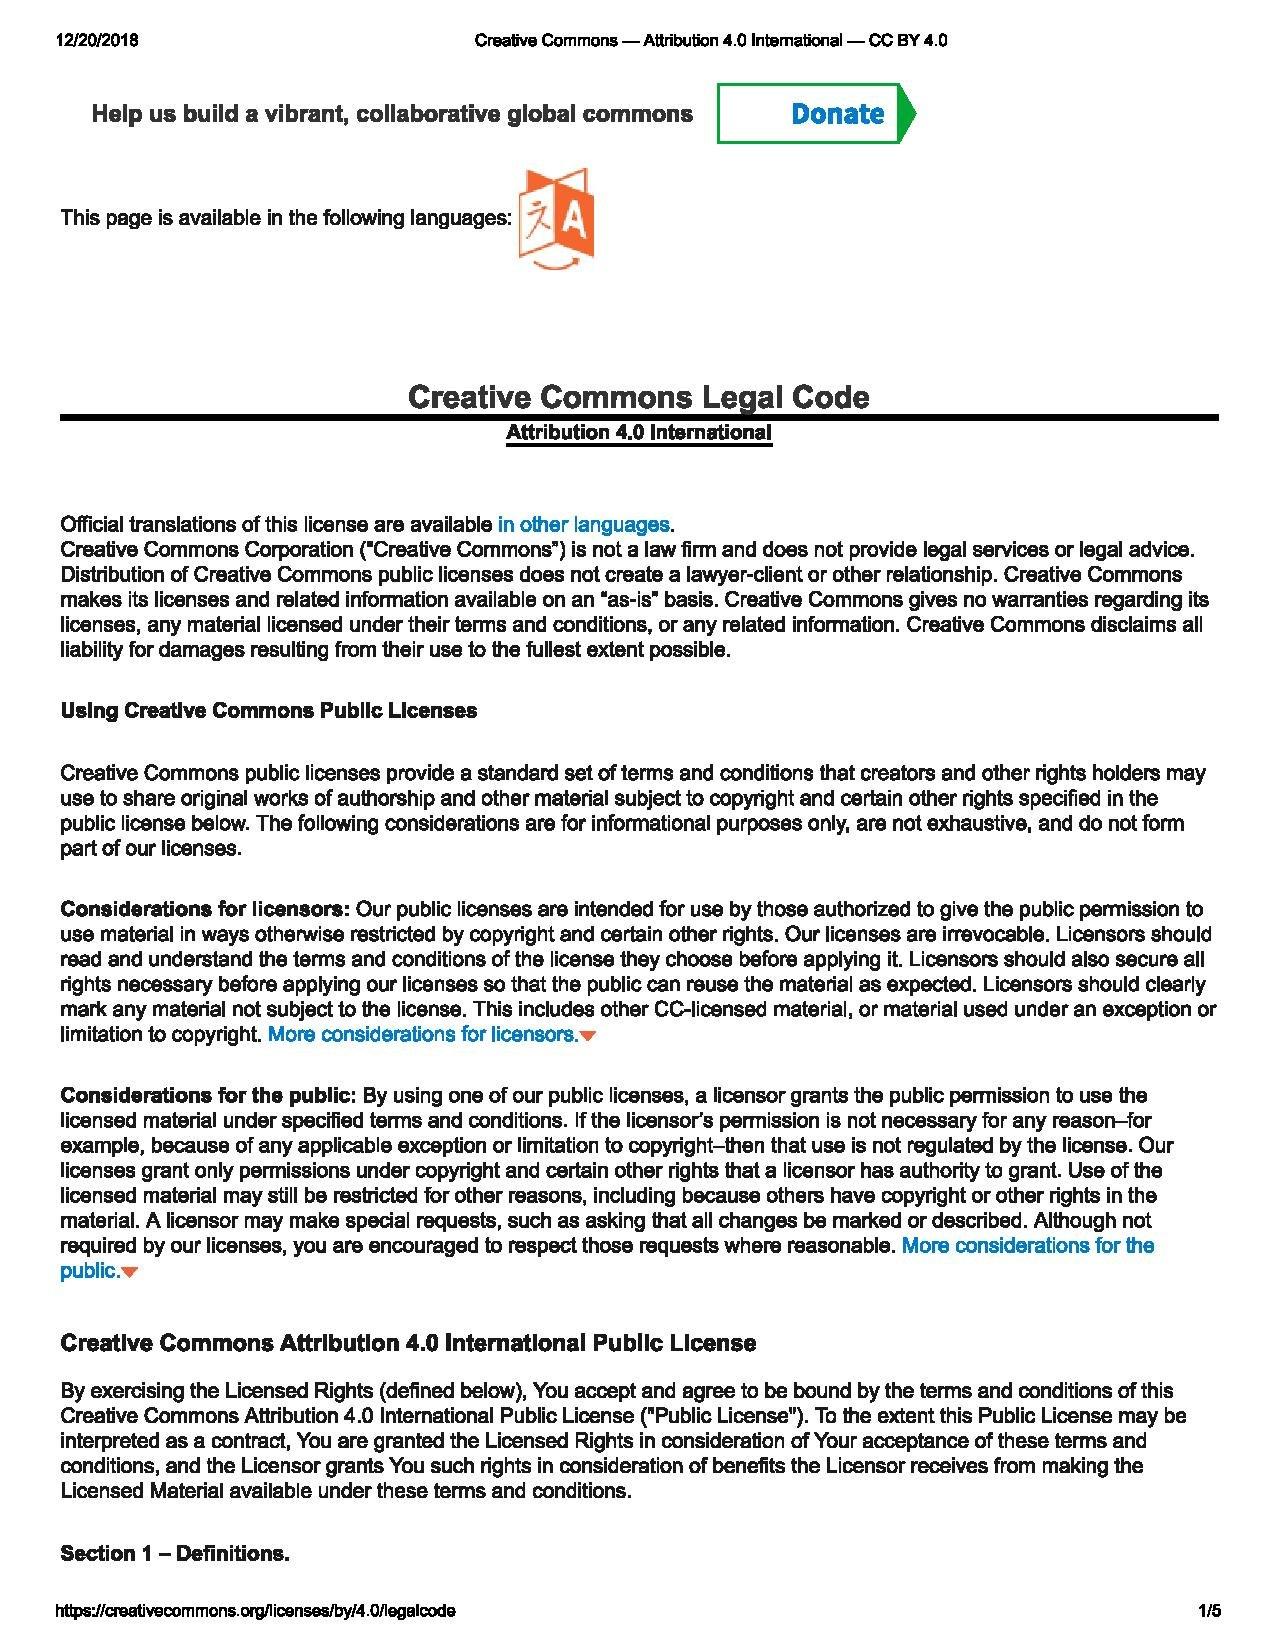 creative commons attribution 4 0 international license